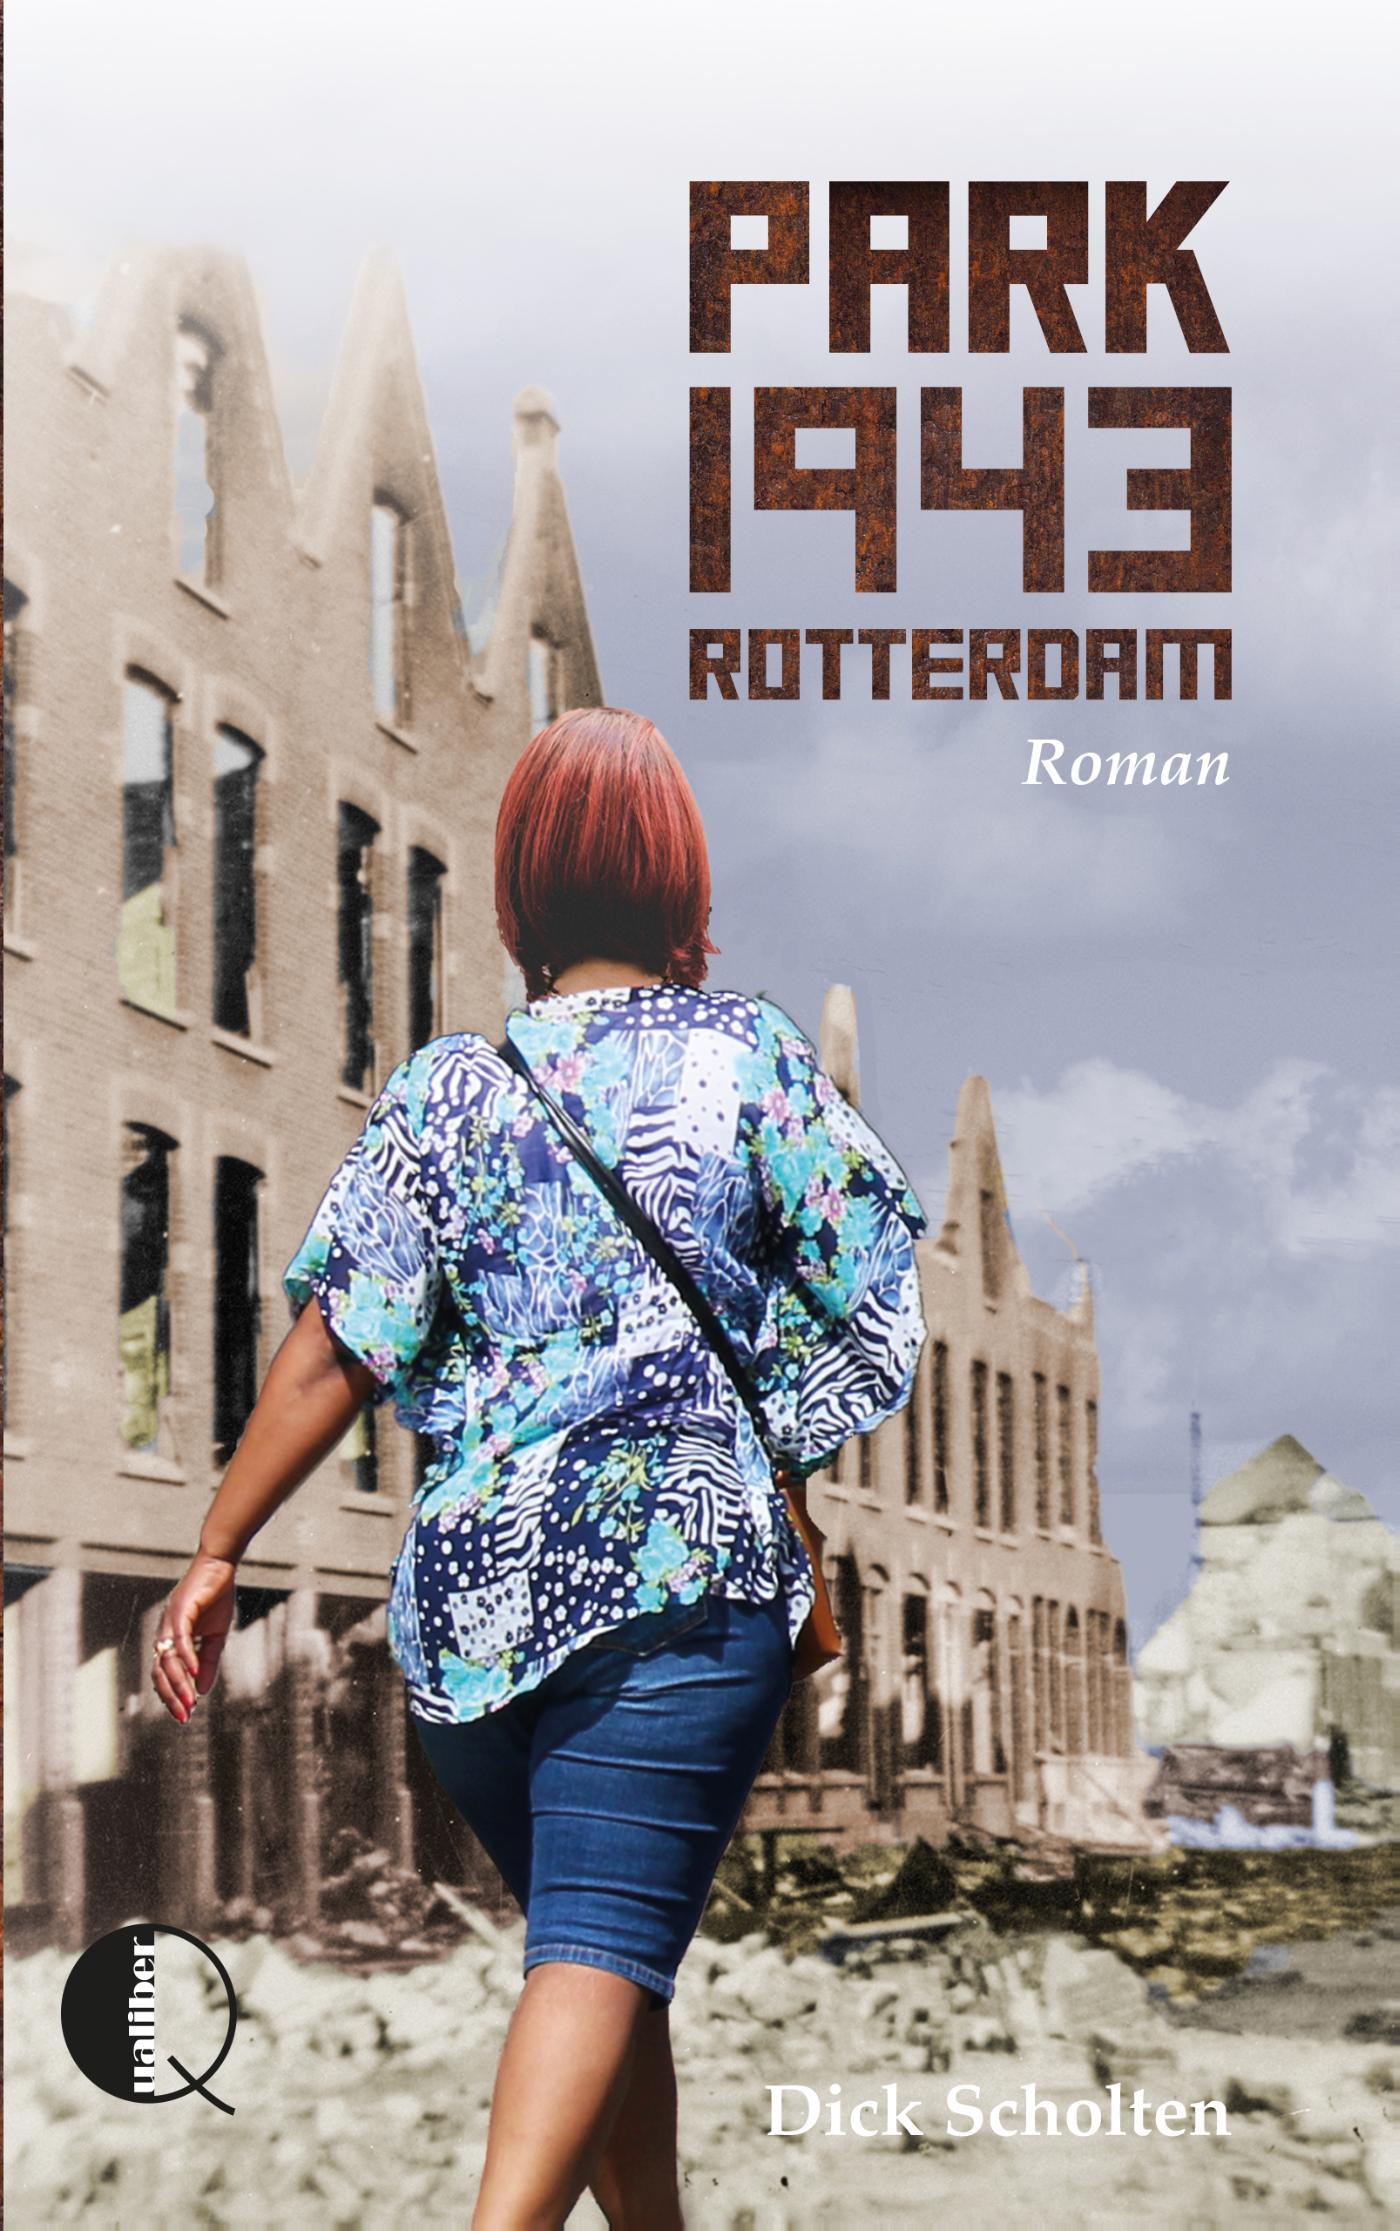 Park 1943 Rotterdam